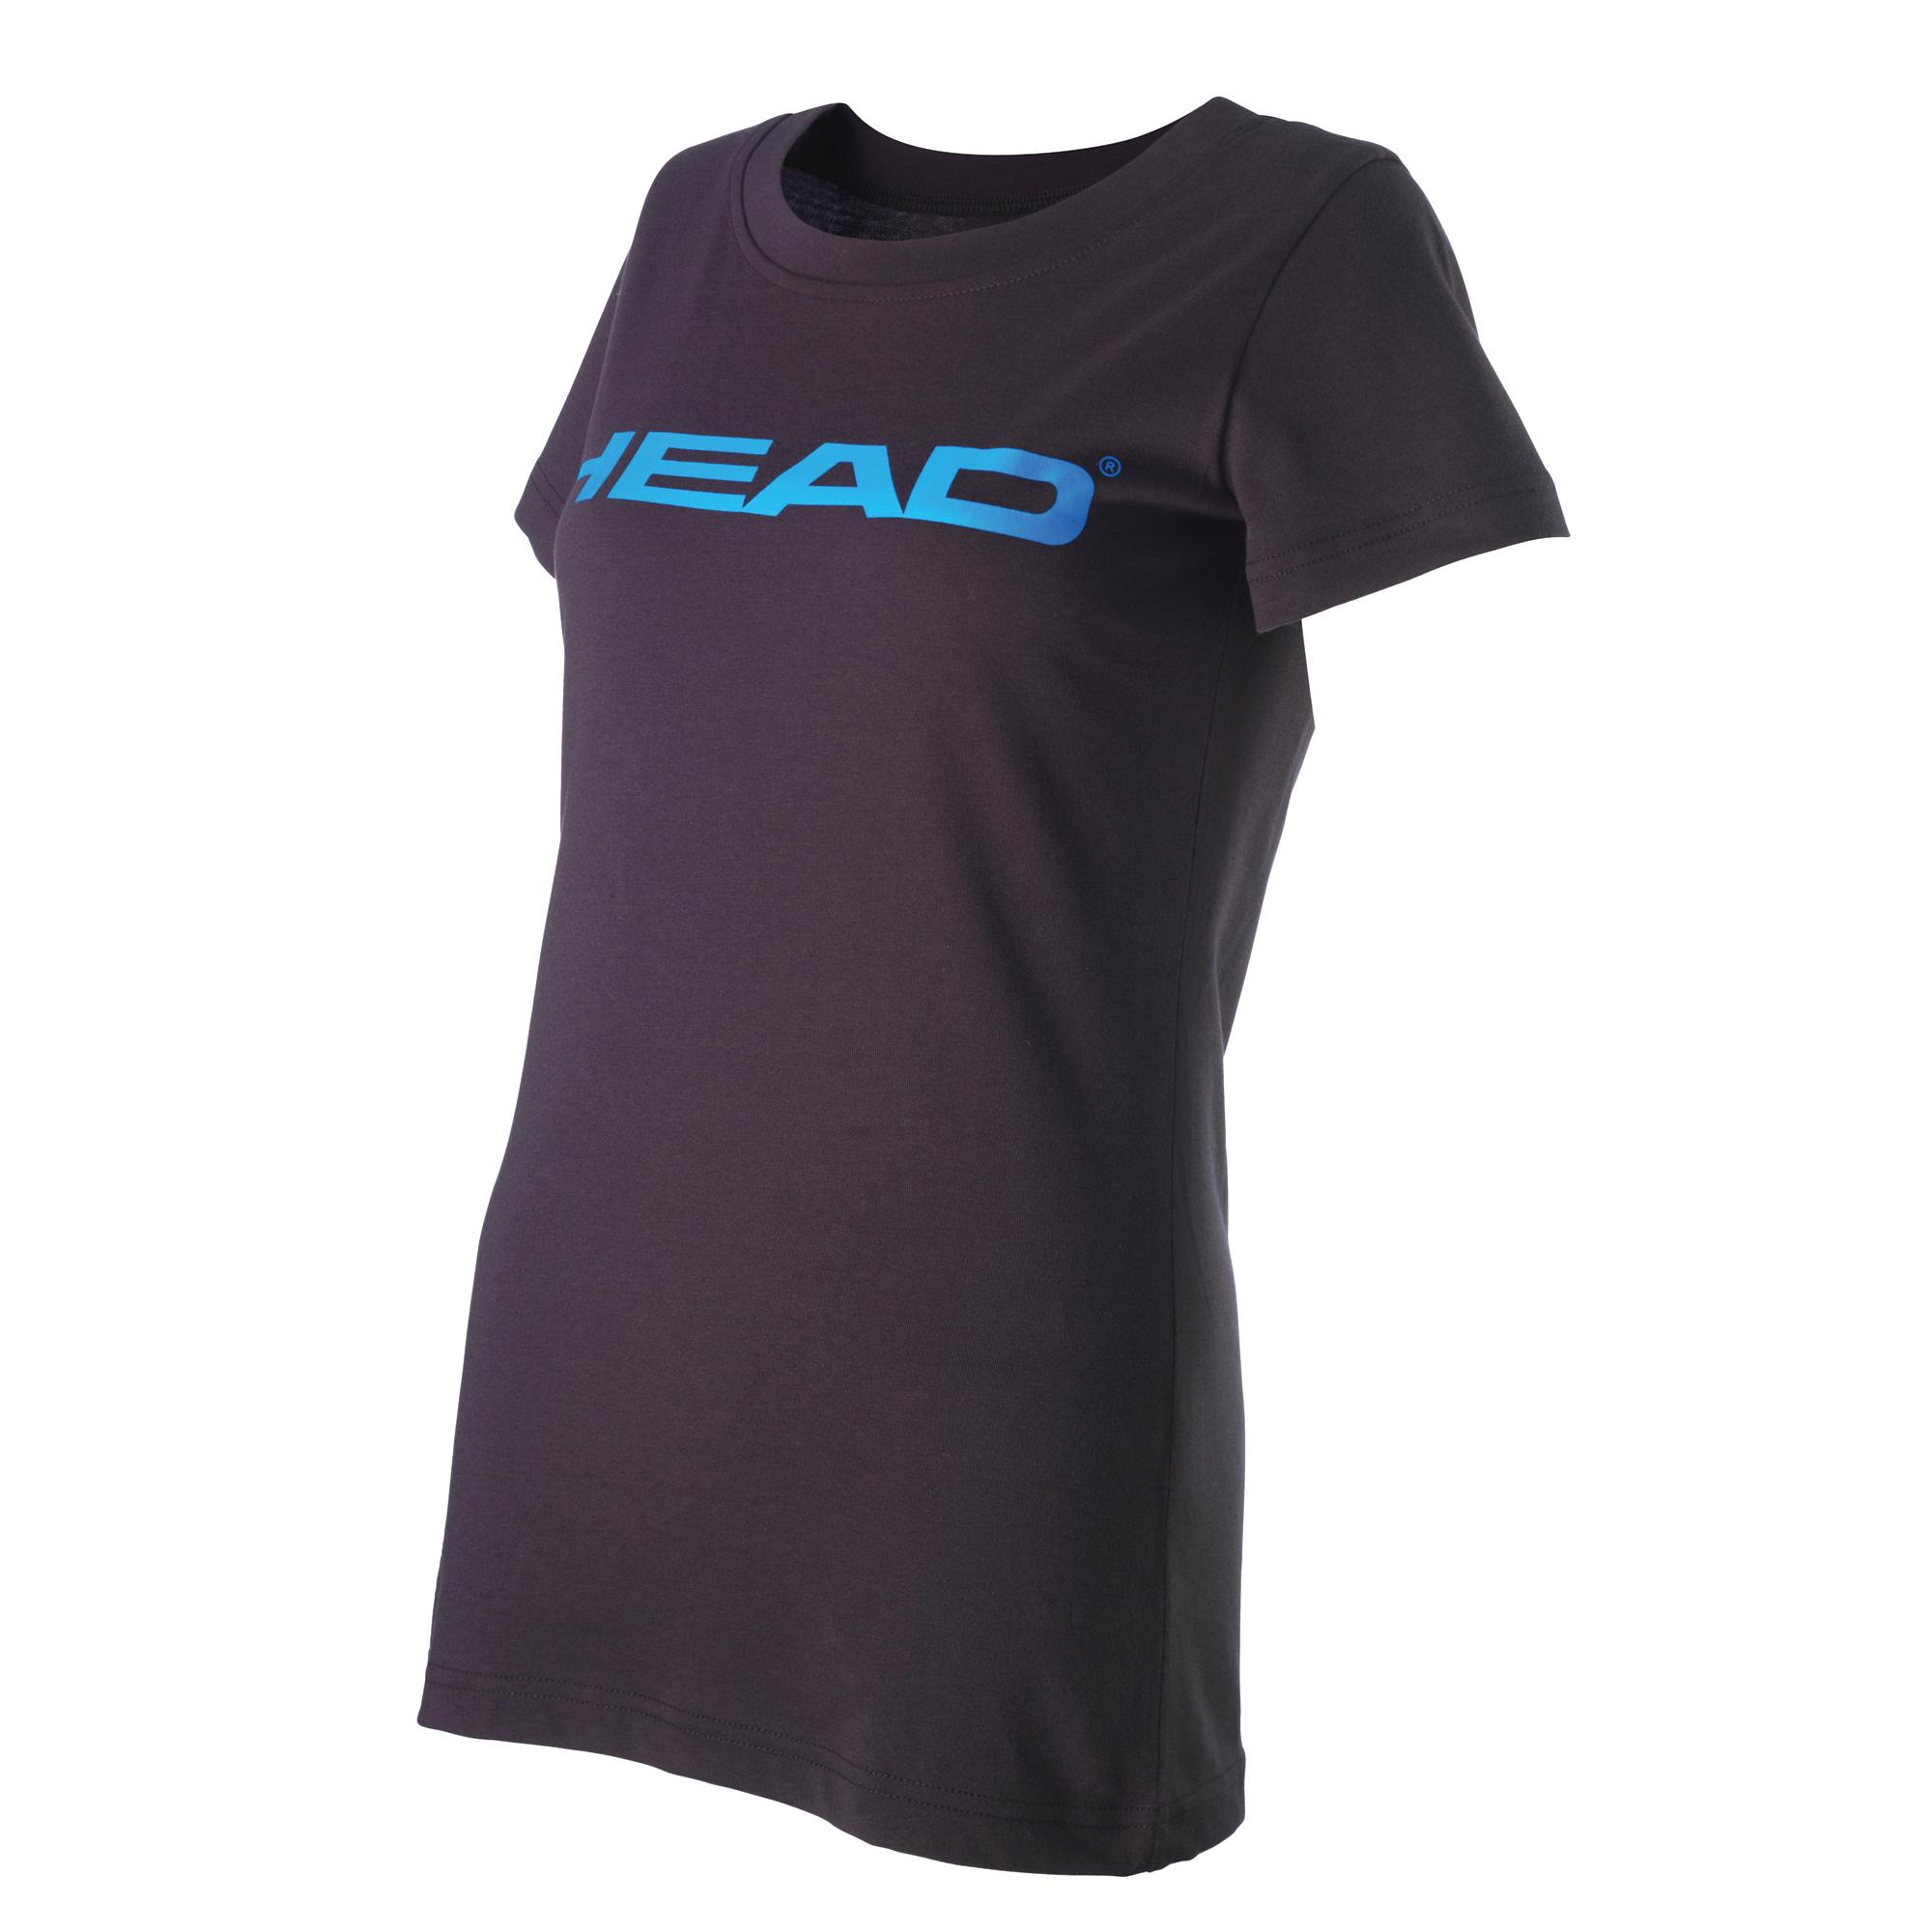 Head Transition Lucy II Ladies T-Shirt SS16 - Black/Blue, L